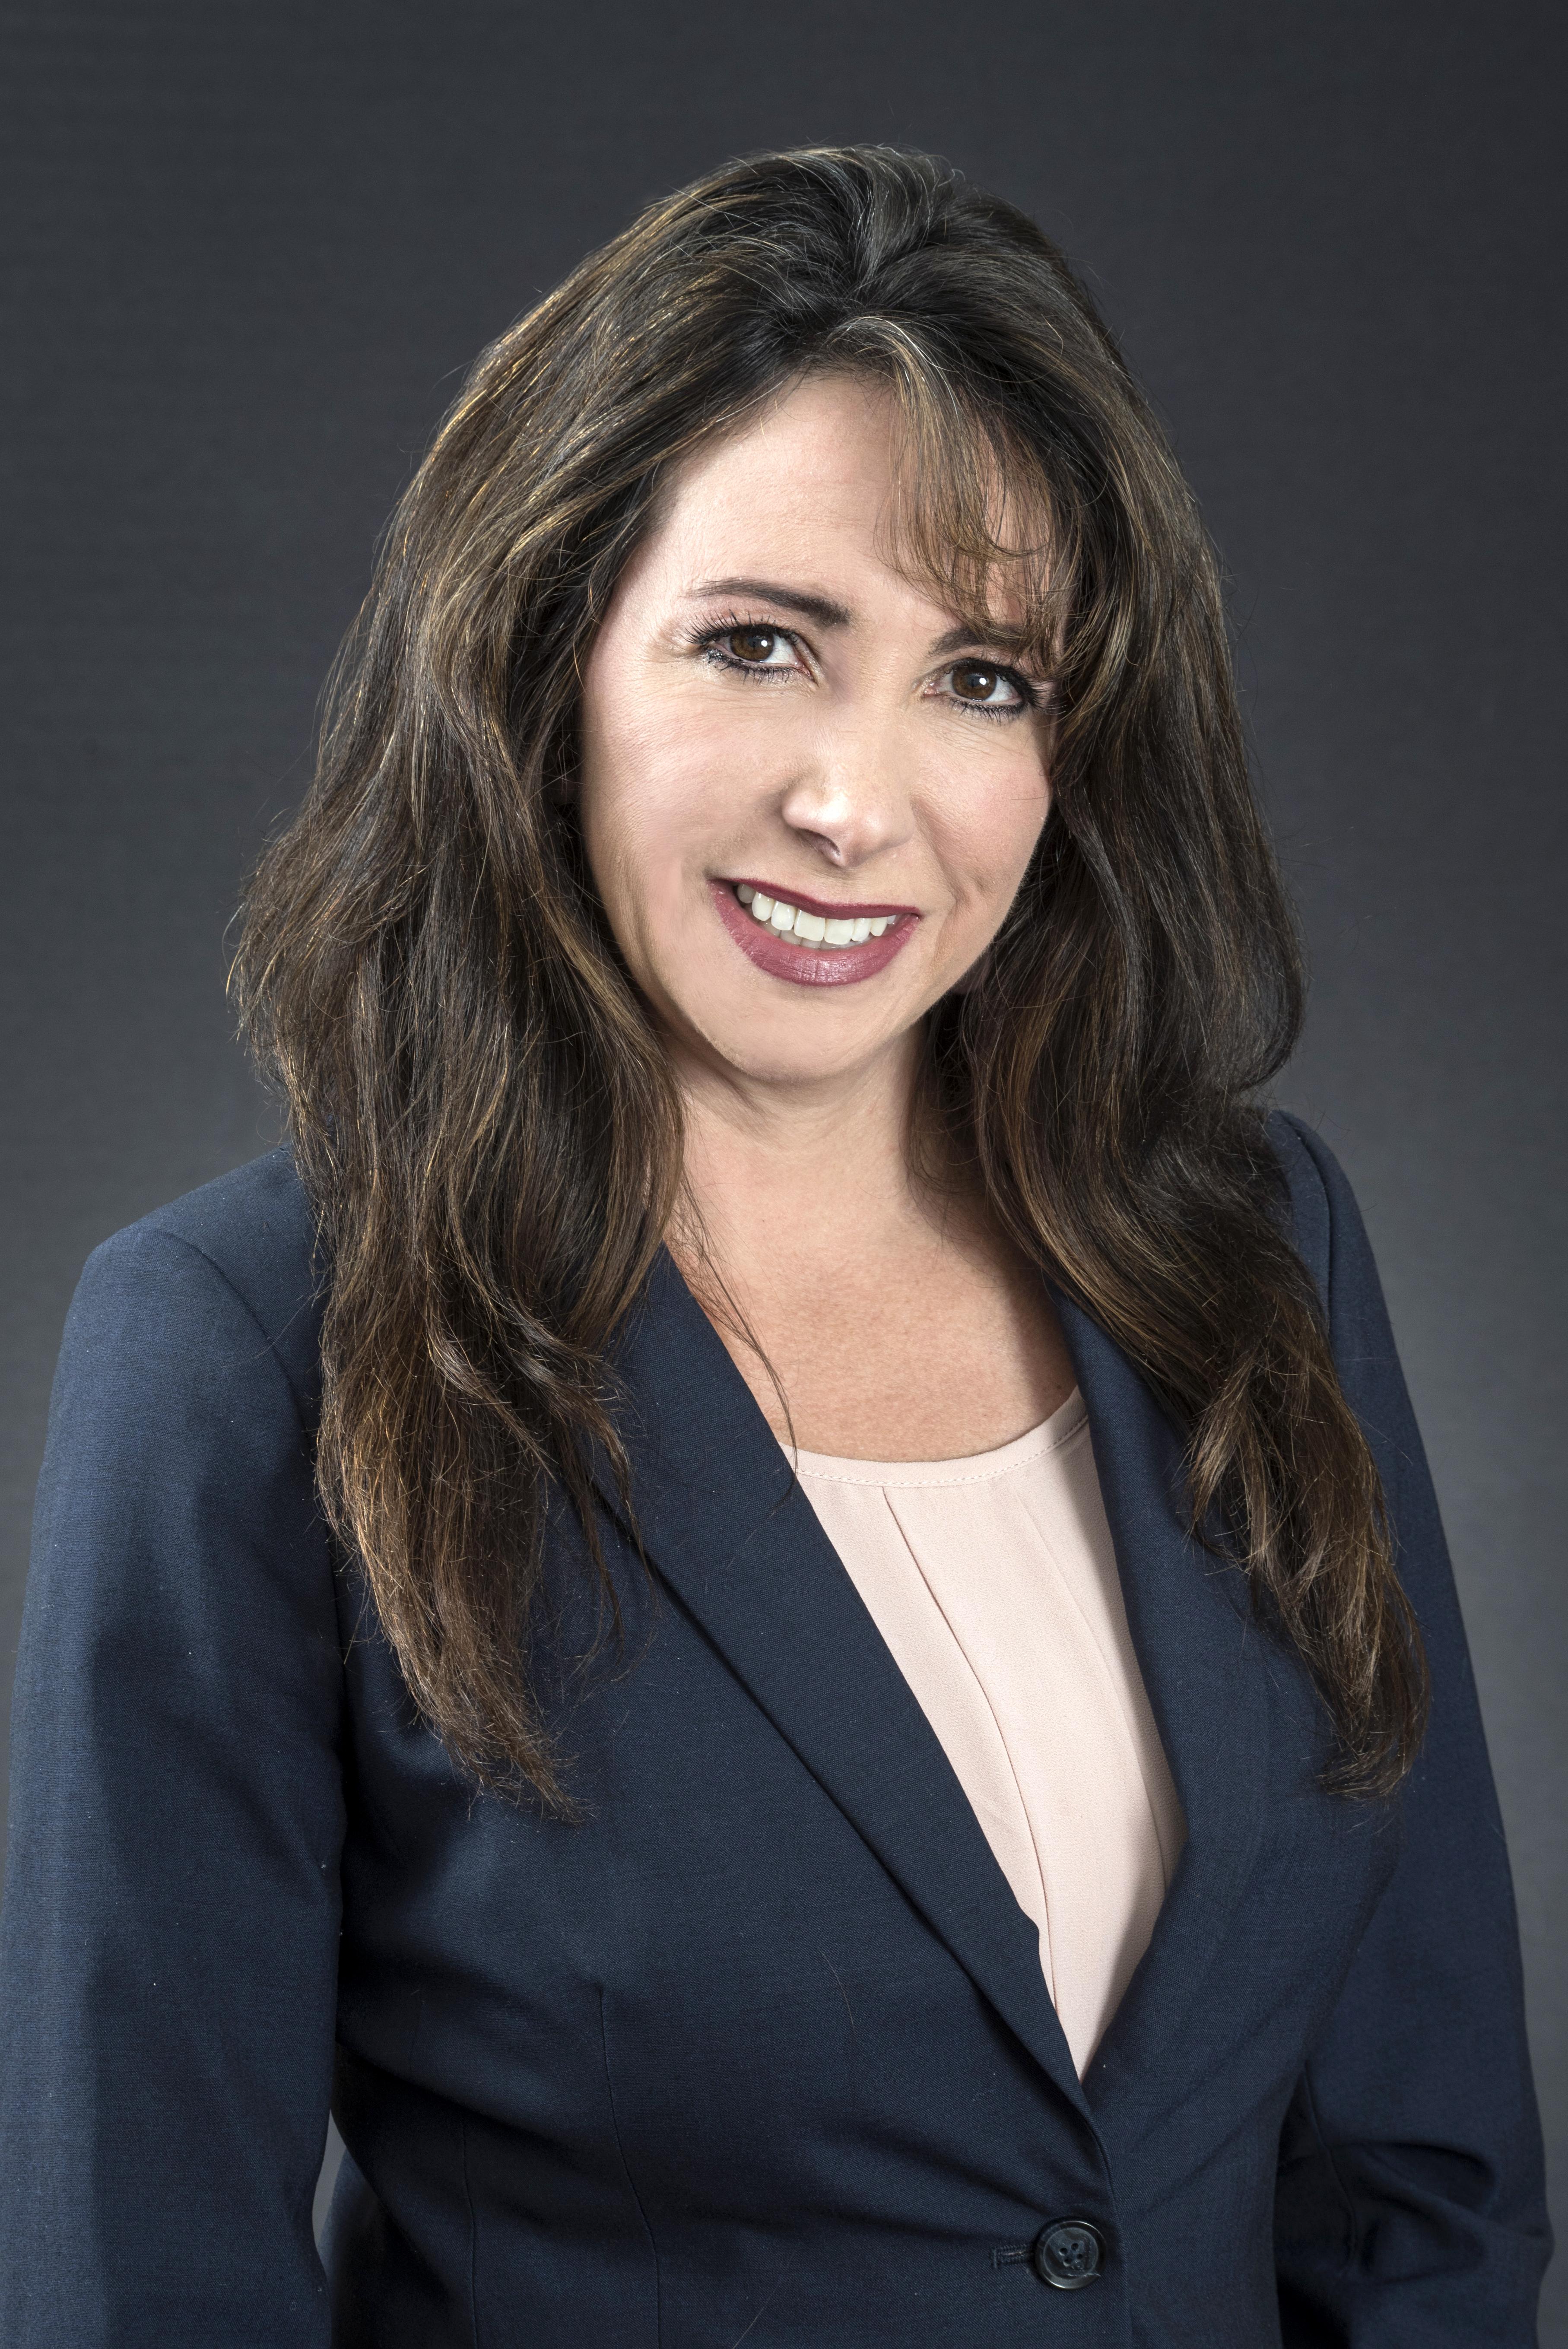 Aprilyn Chavez-Geissler